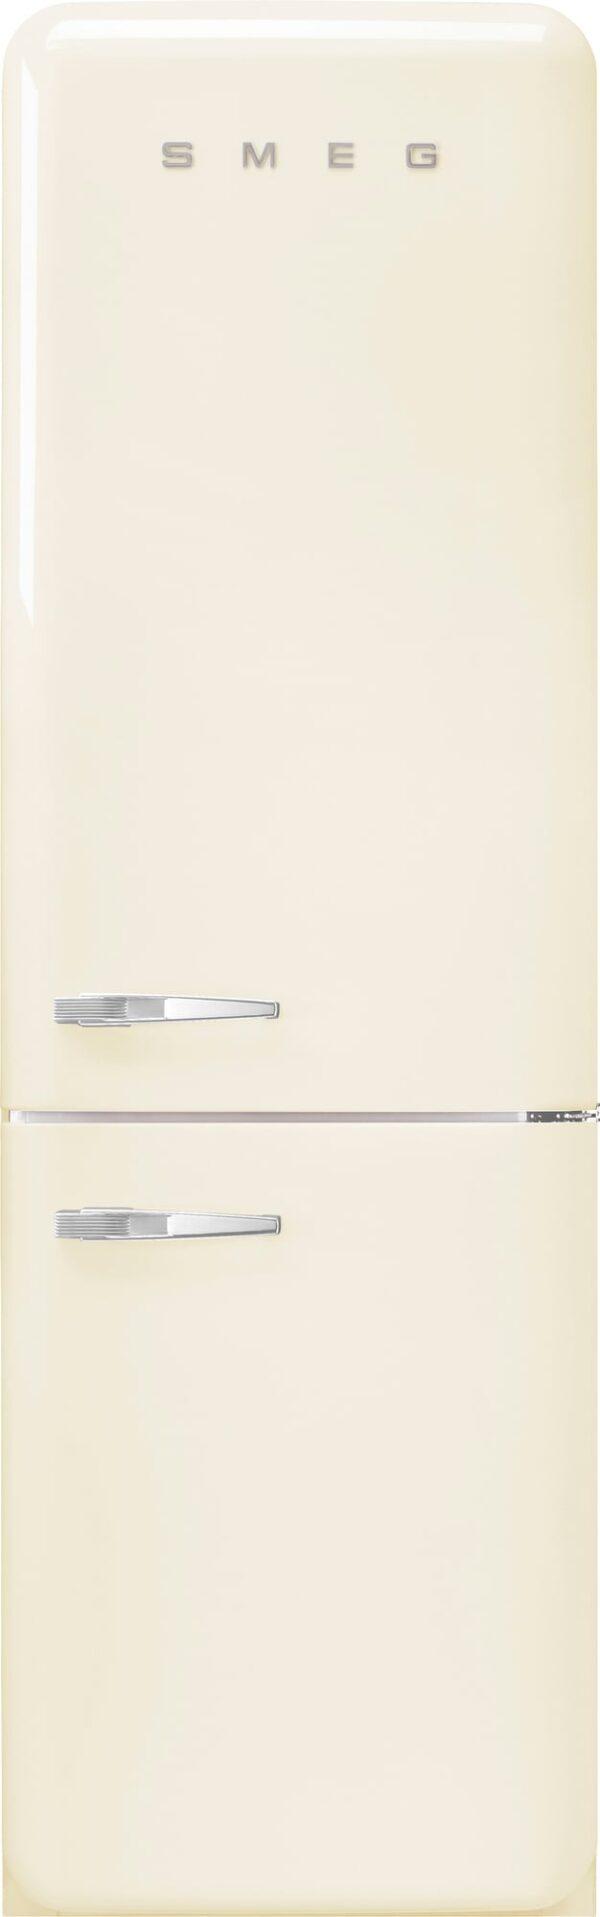 Smeg 50's Style kølefryseskab FAB32RCR5 (cream)